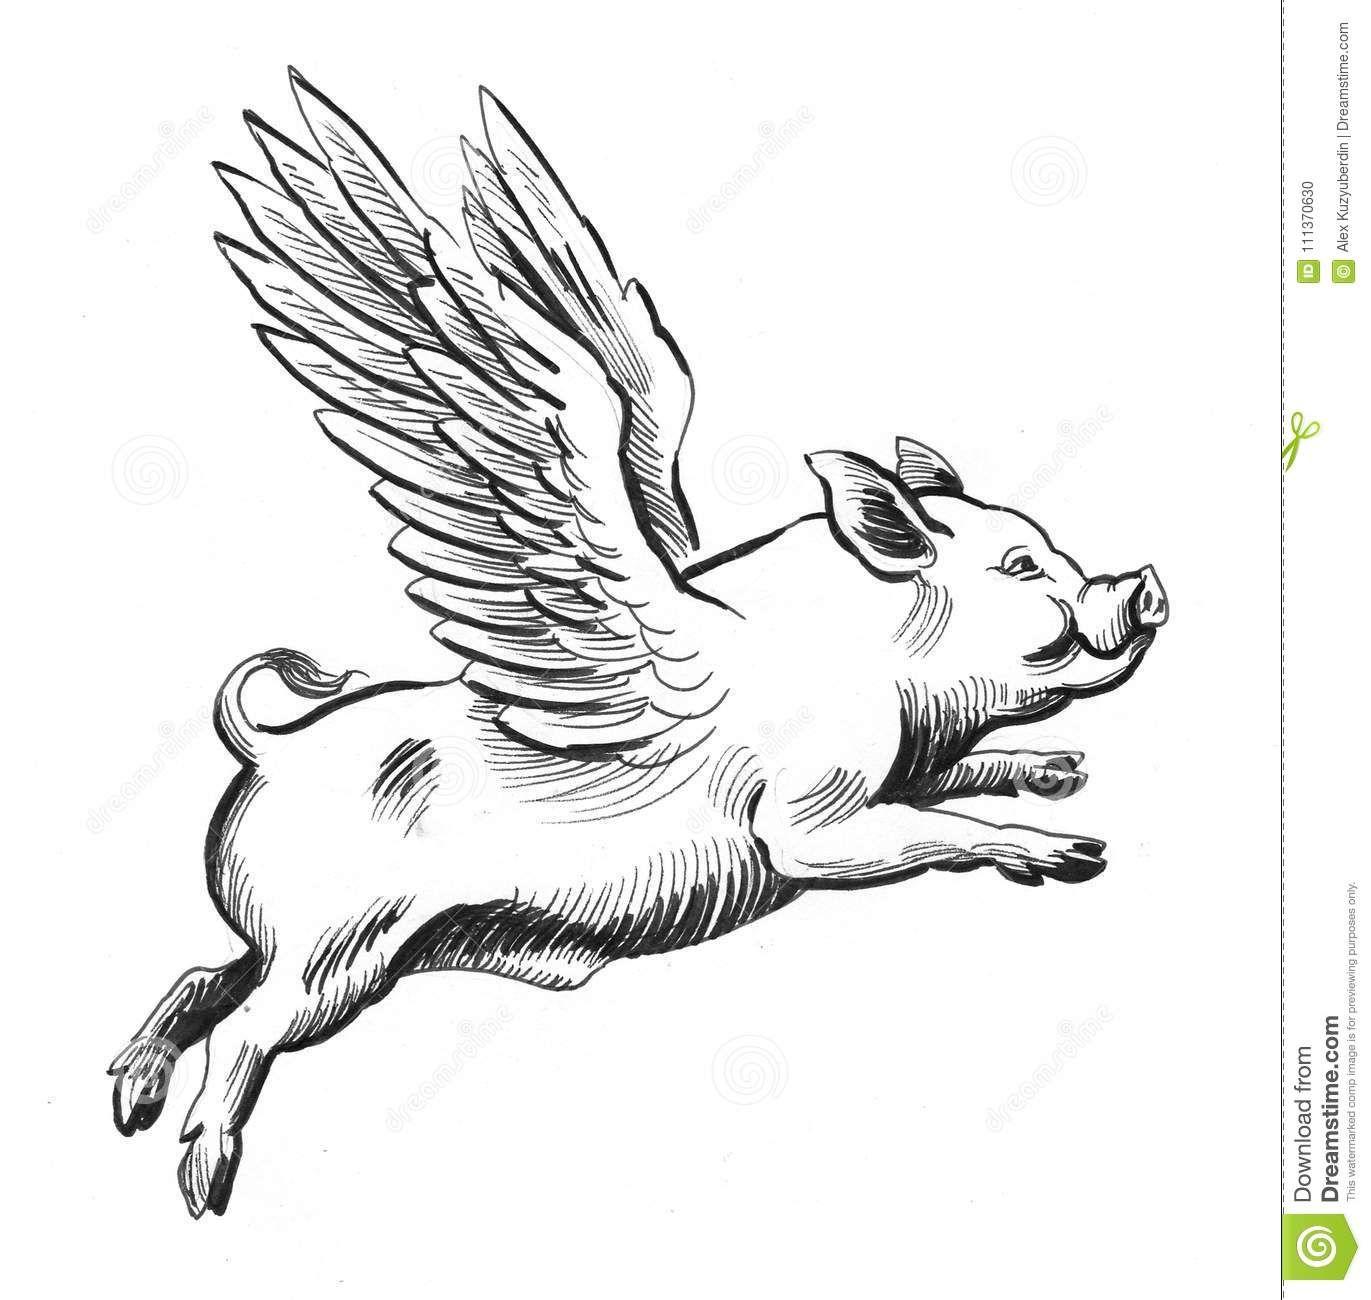 Flying pig flying pigs art pig illustration flying pig